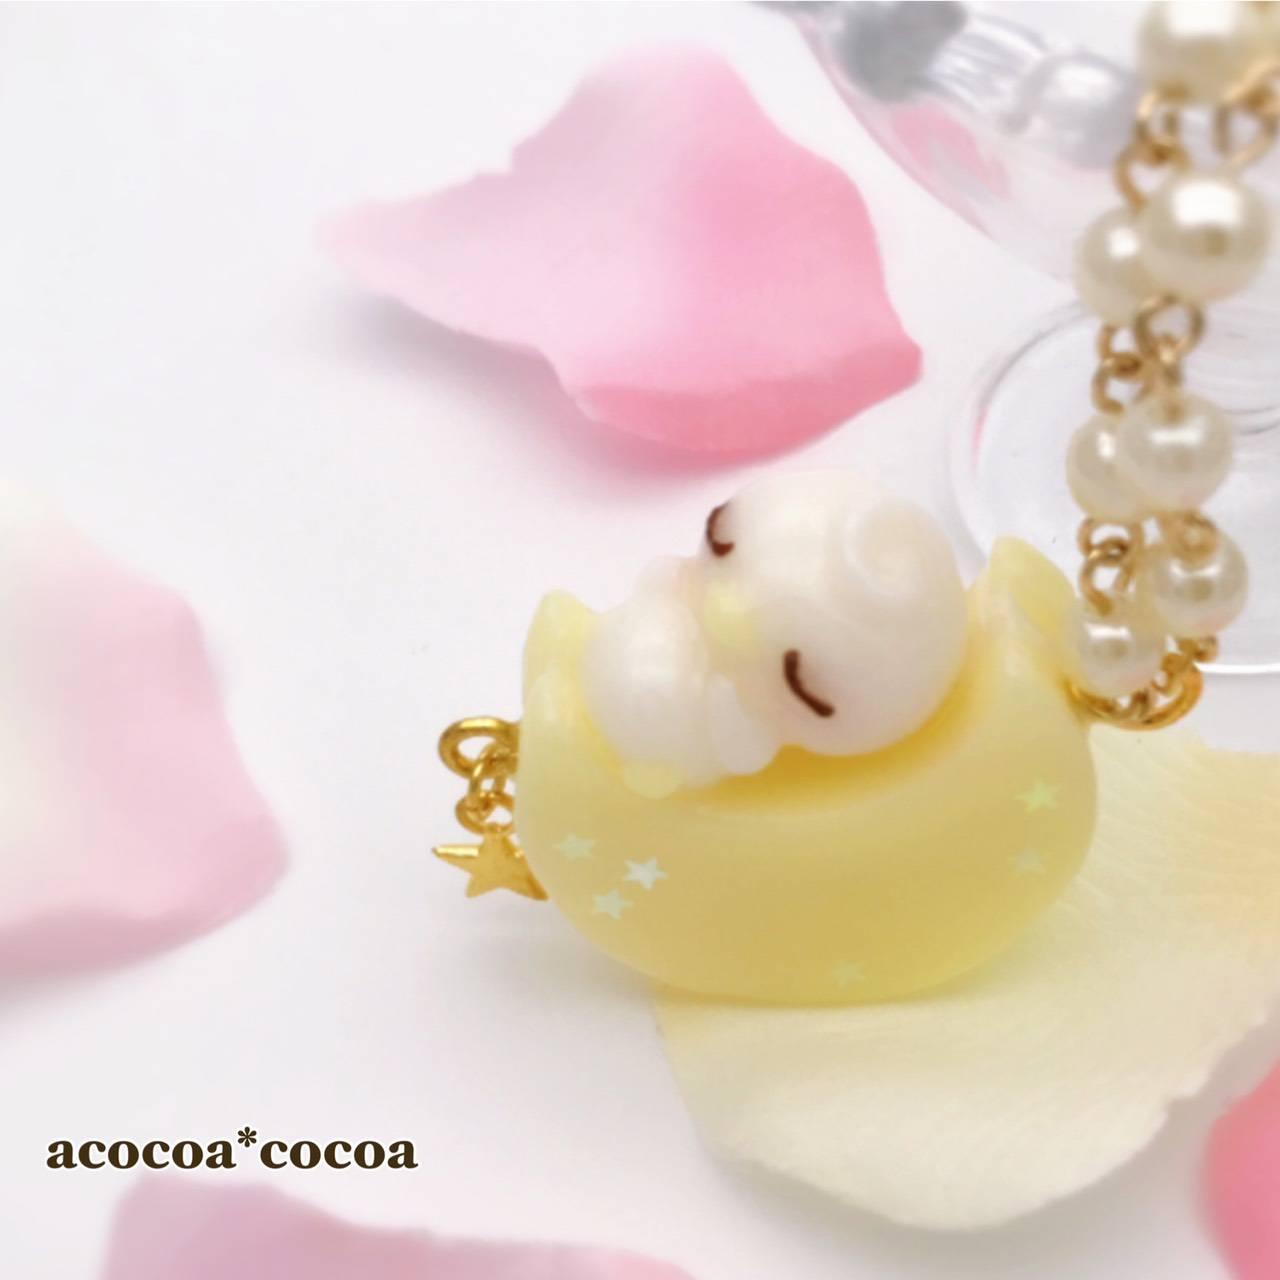 acocoa*cocoa